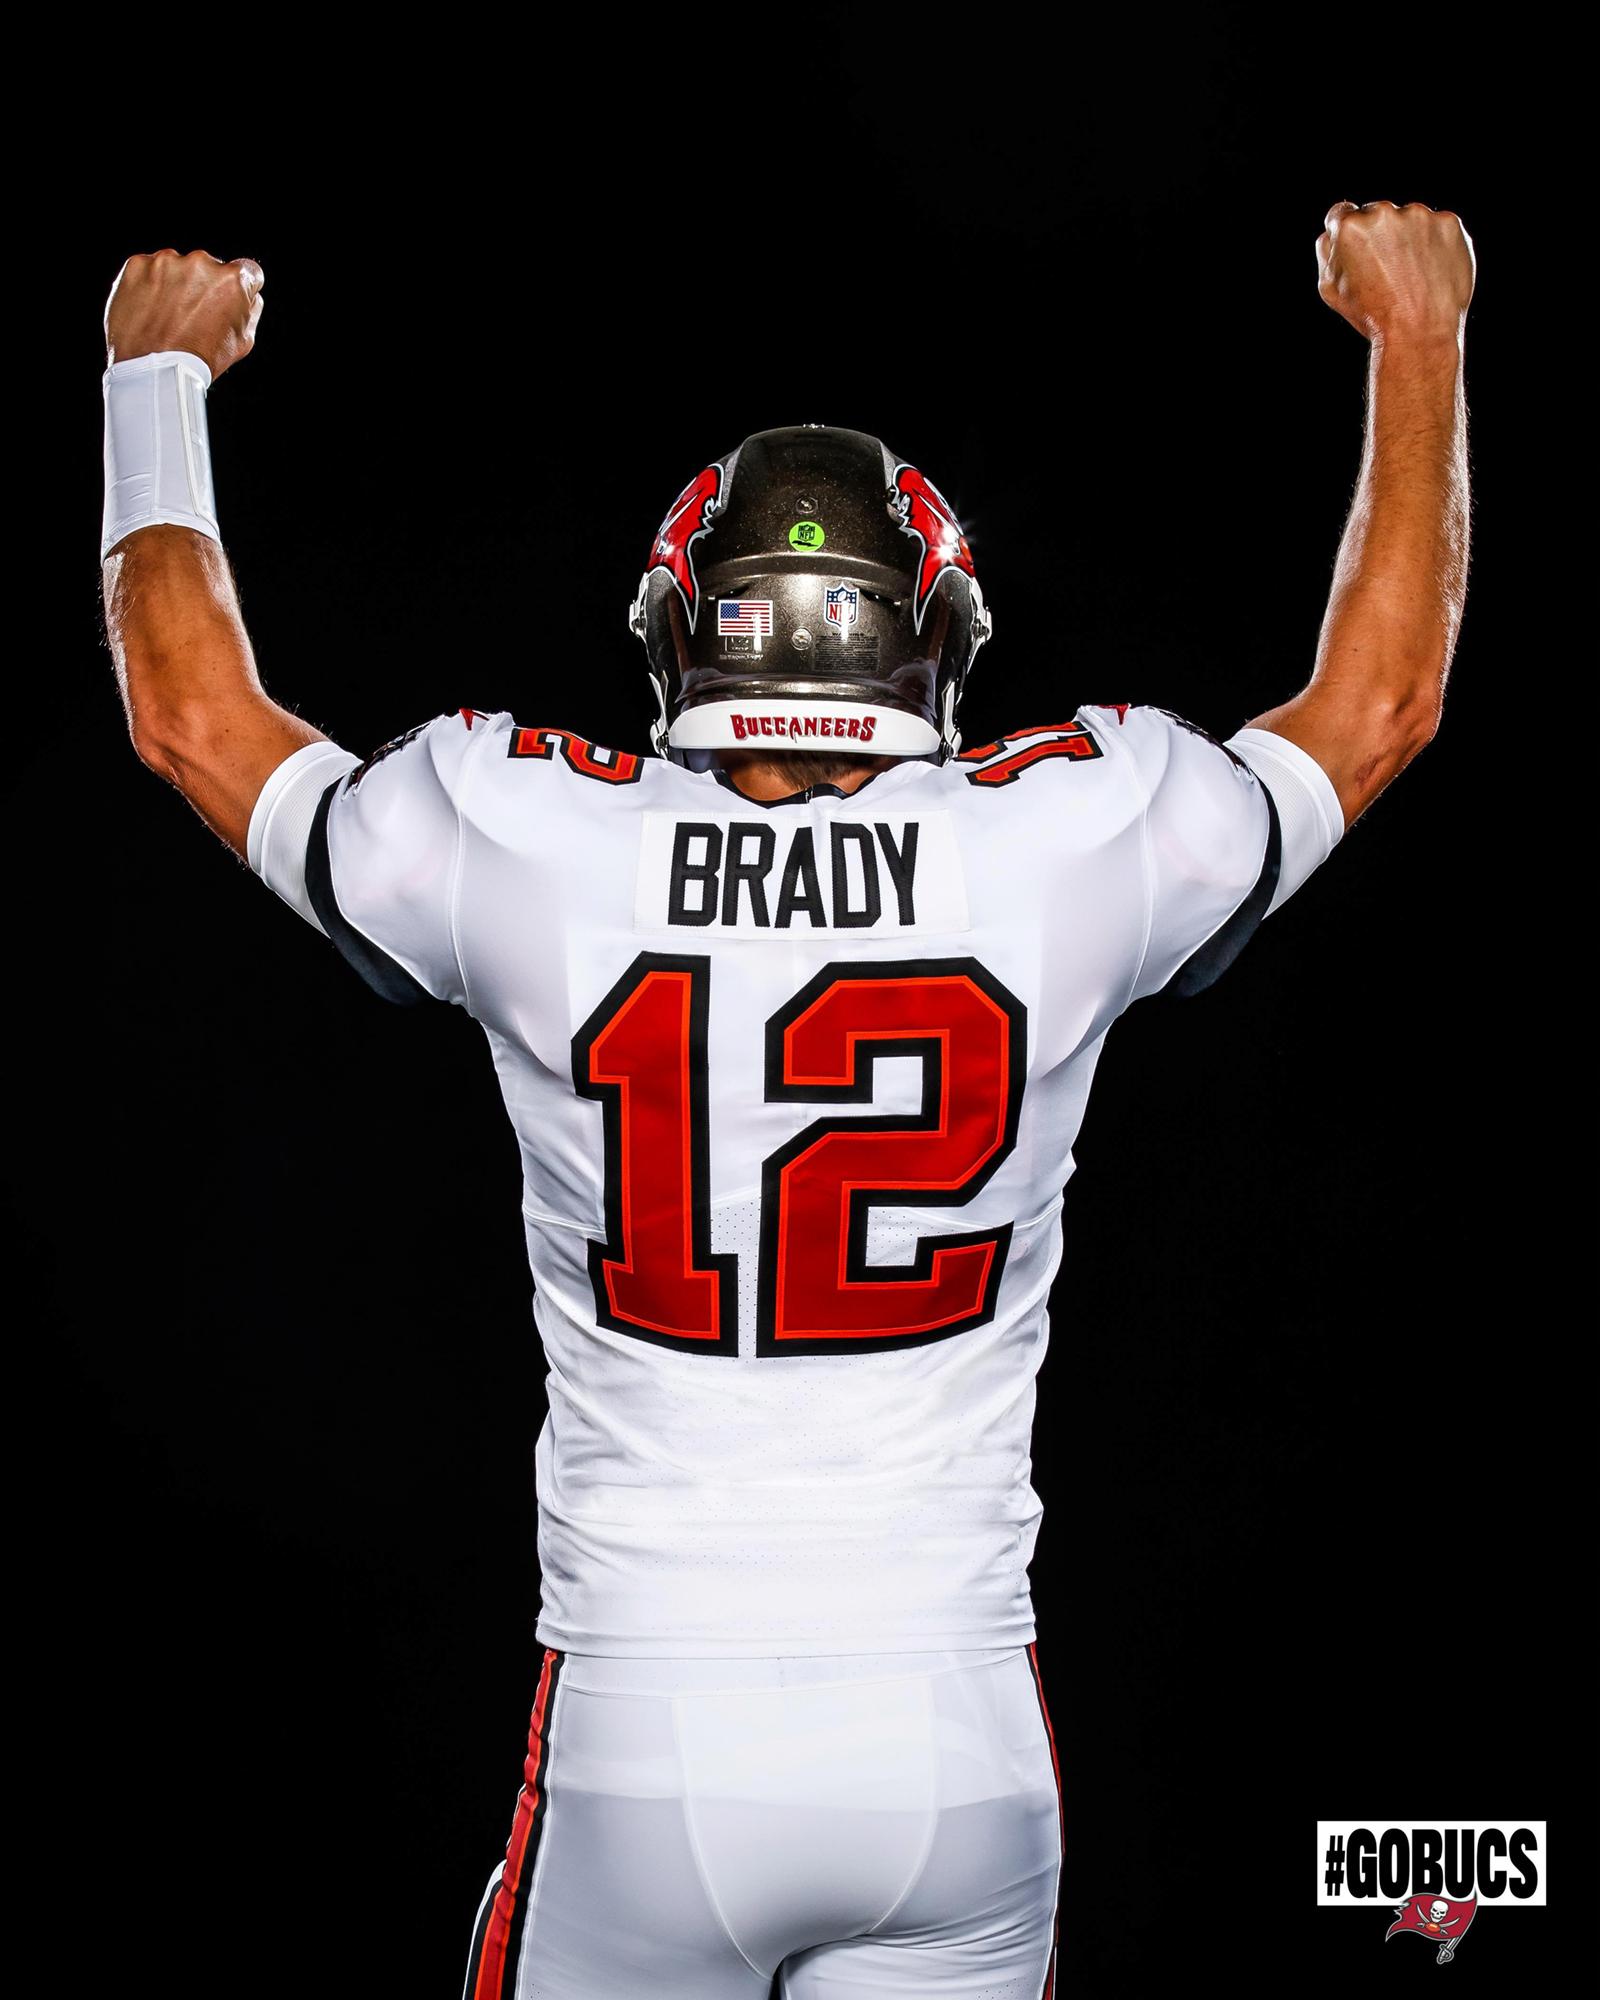 Gisele Bundchen Reacts To Tom Brady In Tampa Bay Uniform